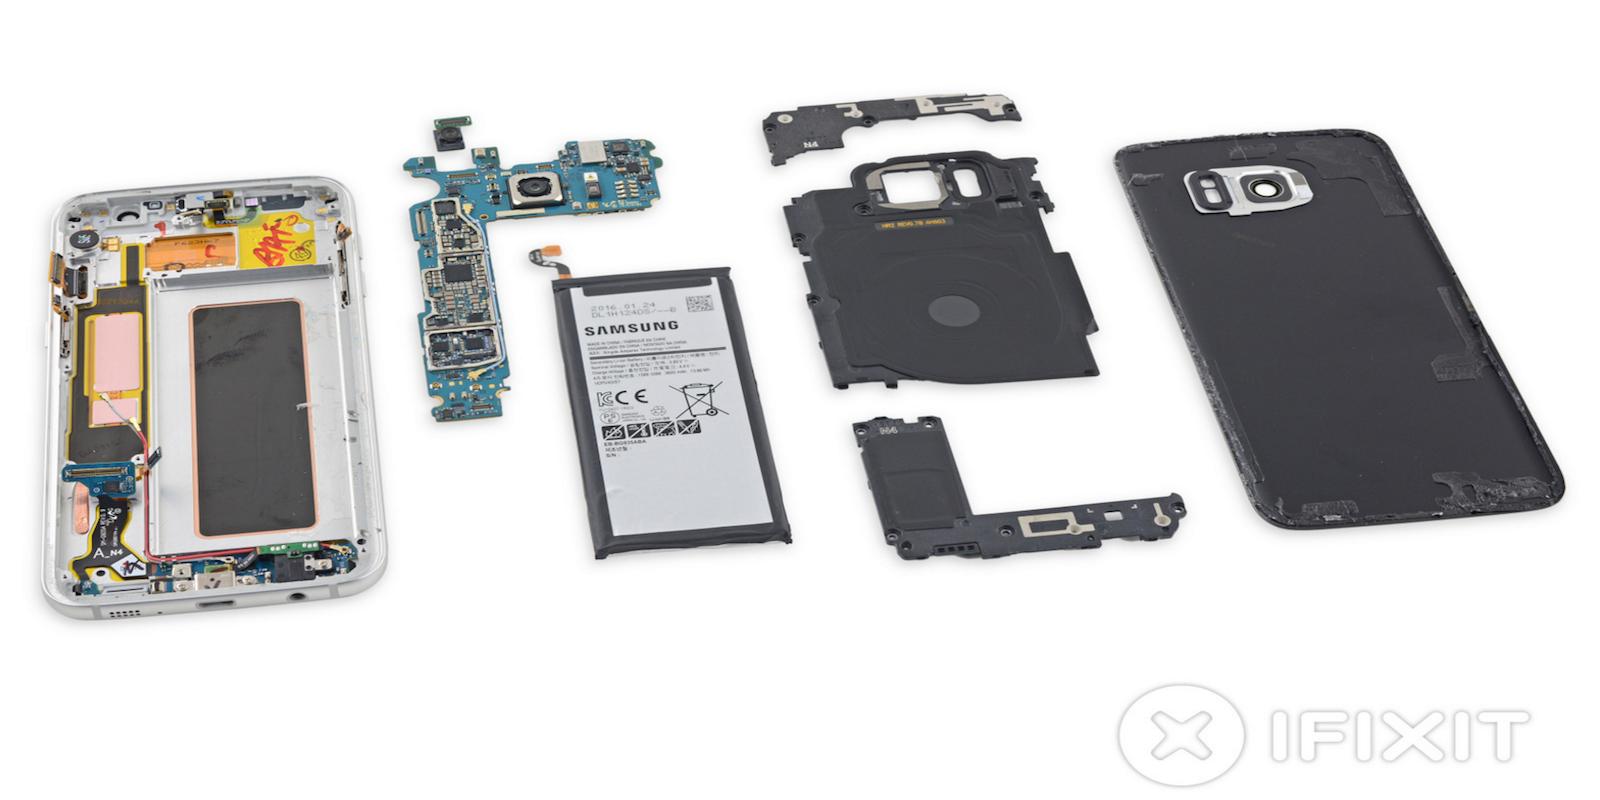 Samsung-Galaxy-S7-edge-teardown